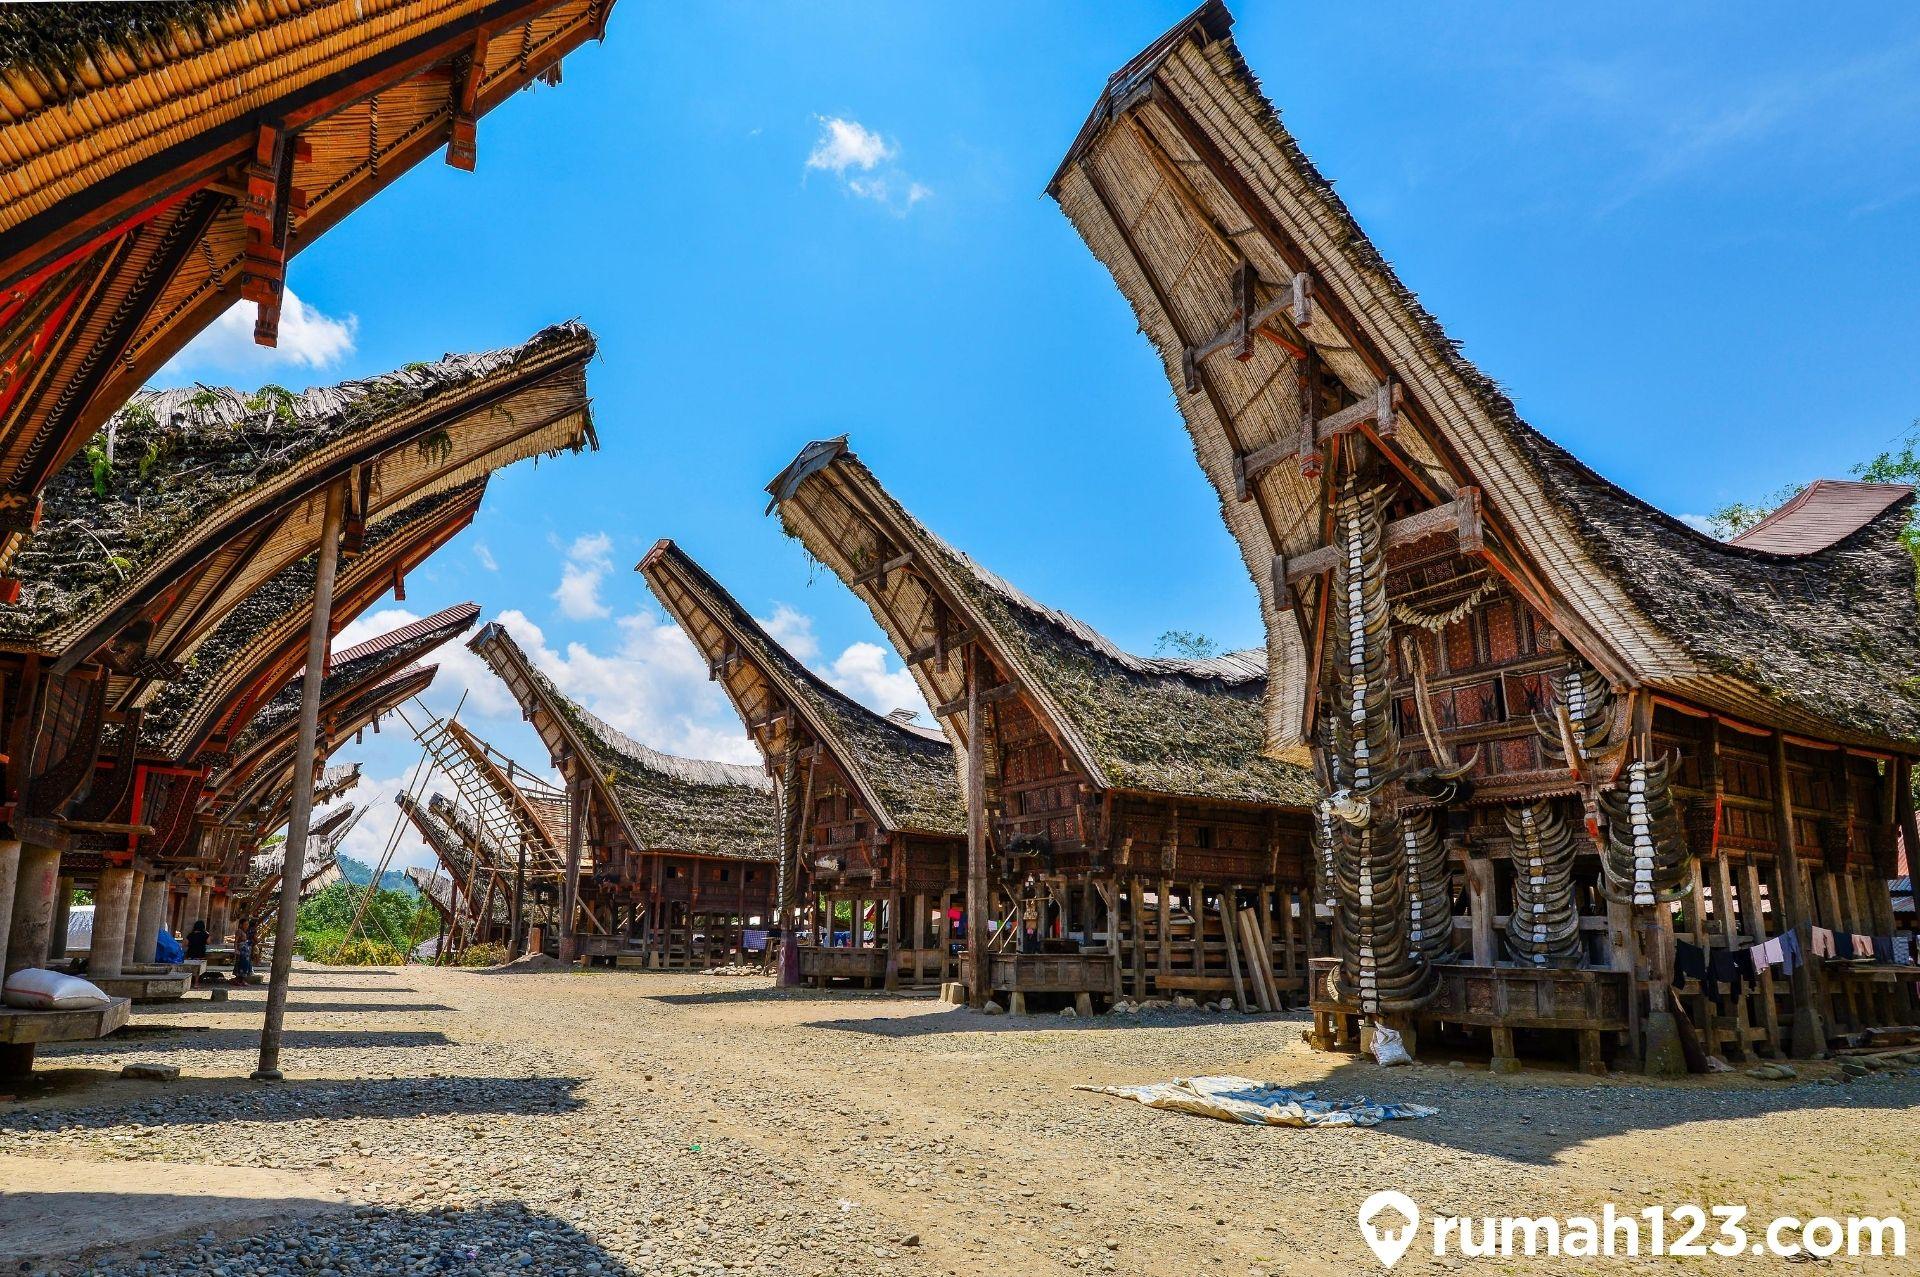 Rumah Tongkonan Dan Filosofi Etnis Toraja Yang Sangat Kuat Rumah123 Com